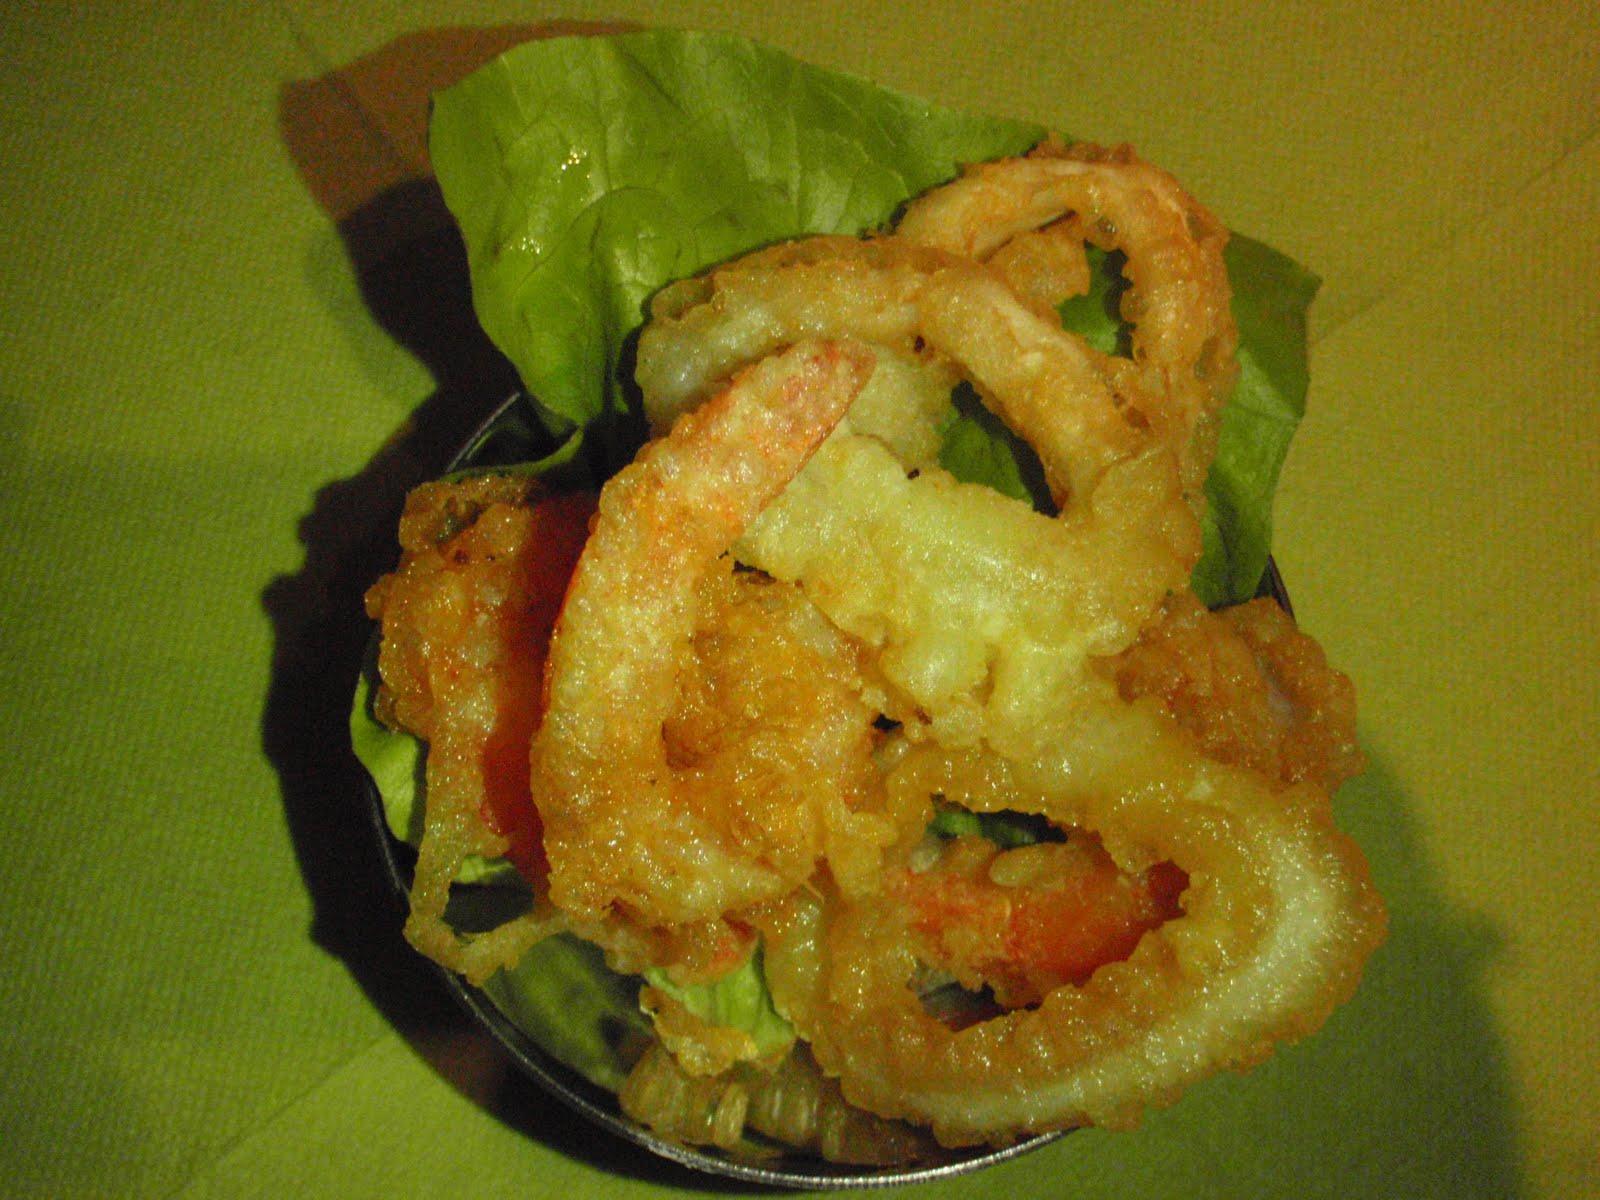 mon carnet de cuisine tempura de crevettes et calamars. Black Bedroom Furniture Sets. Home Design Ideas